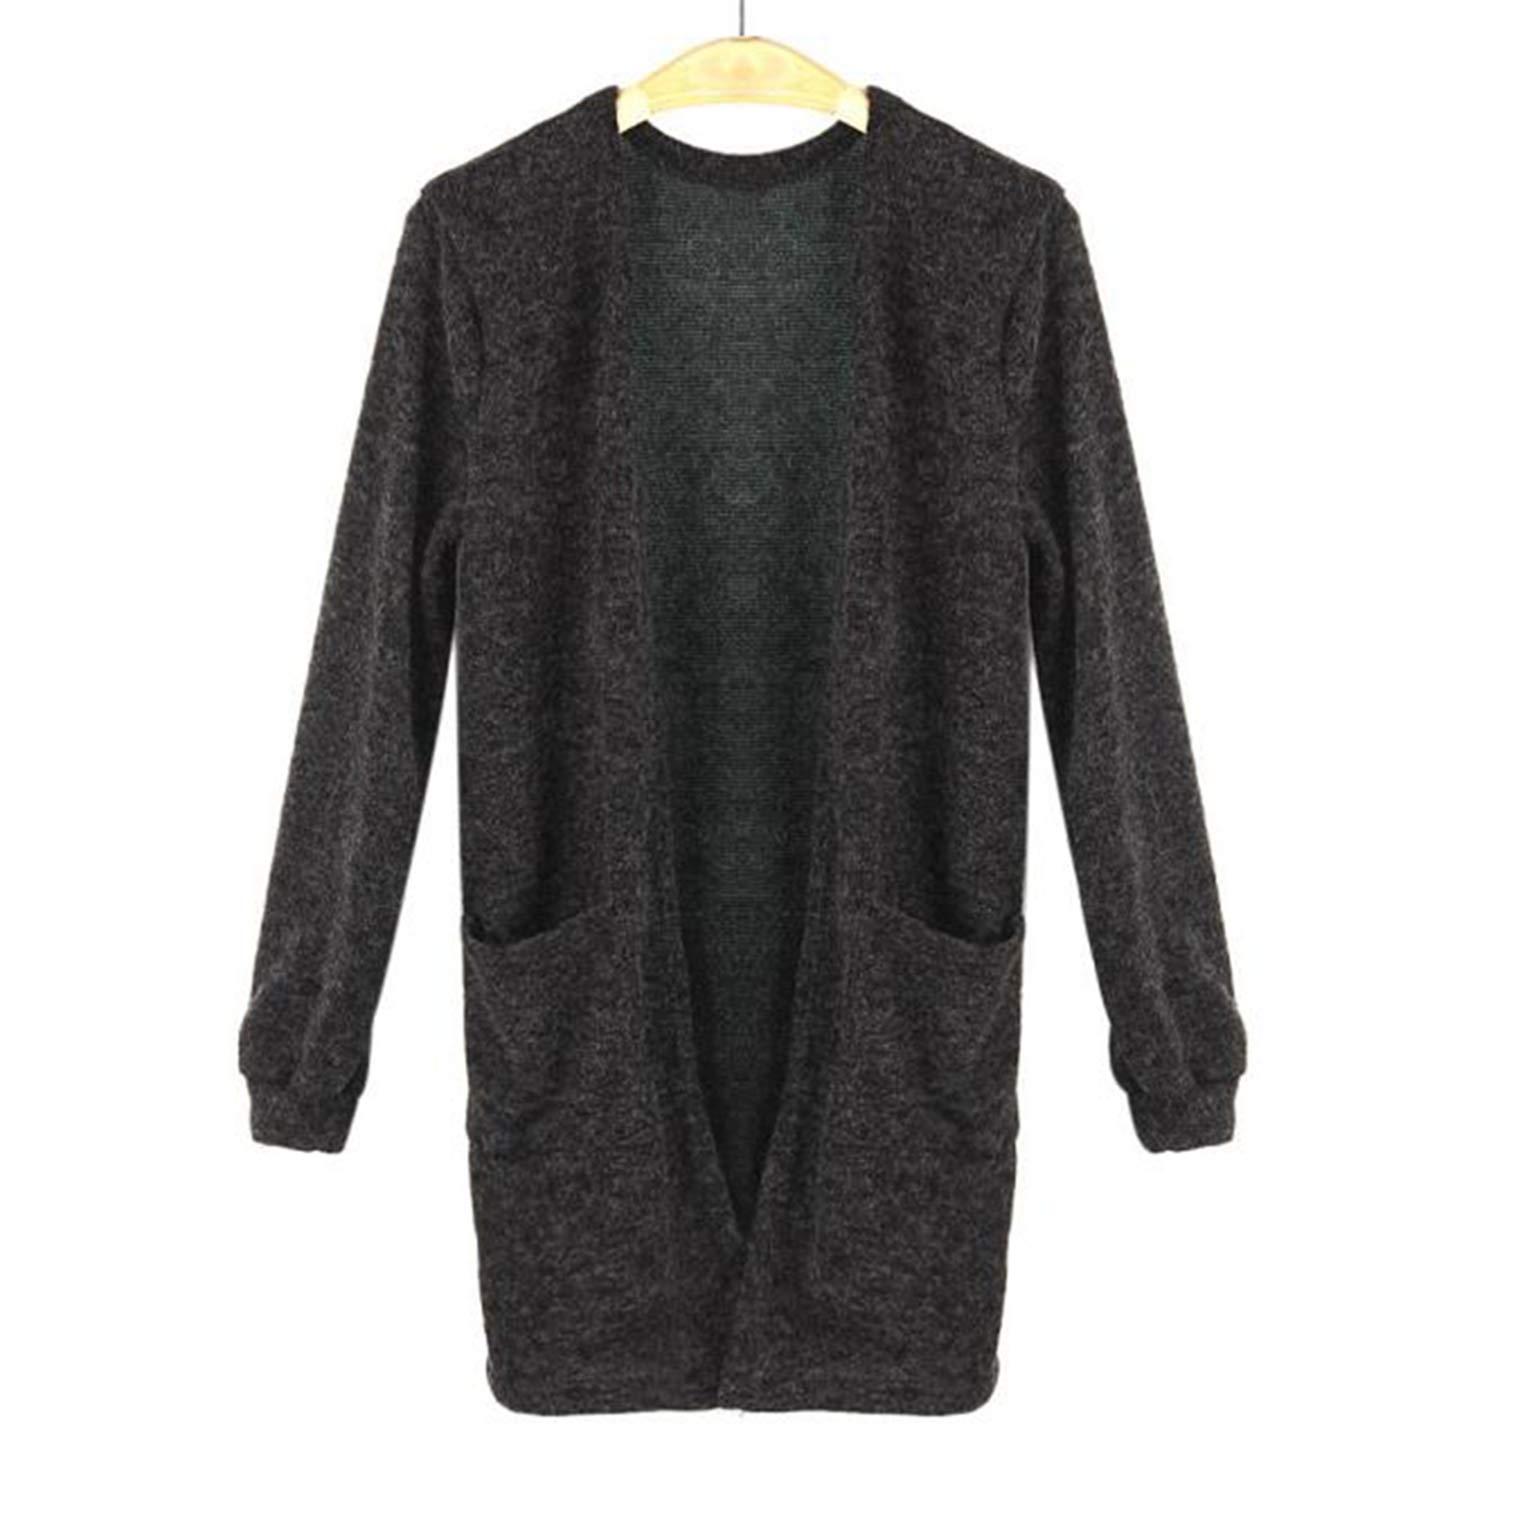 VANSOON Womens Long Sleeve Knitted Cardigan Outwear Coat, Tops Loose Sweater Casual Jacket Coat Sweater Tunic Sweatshirt